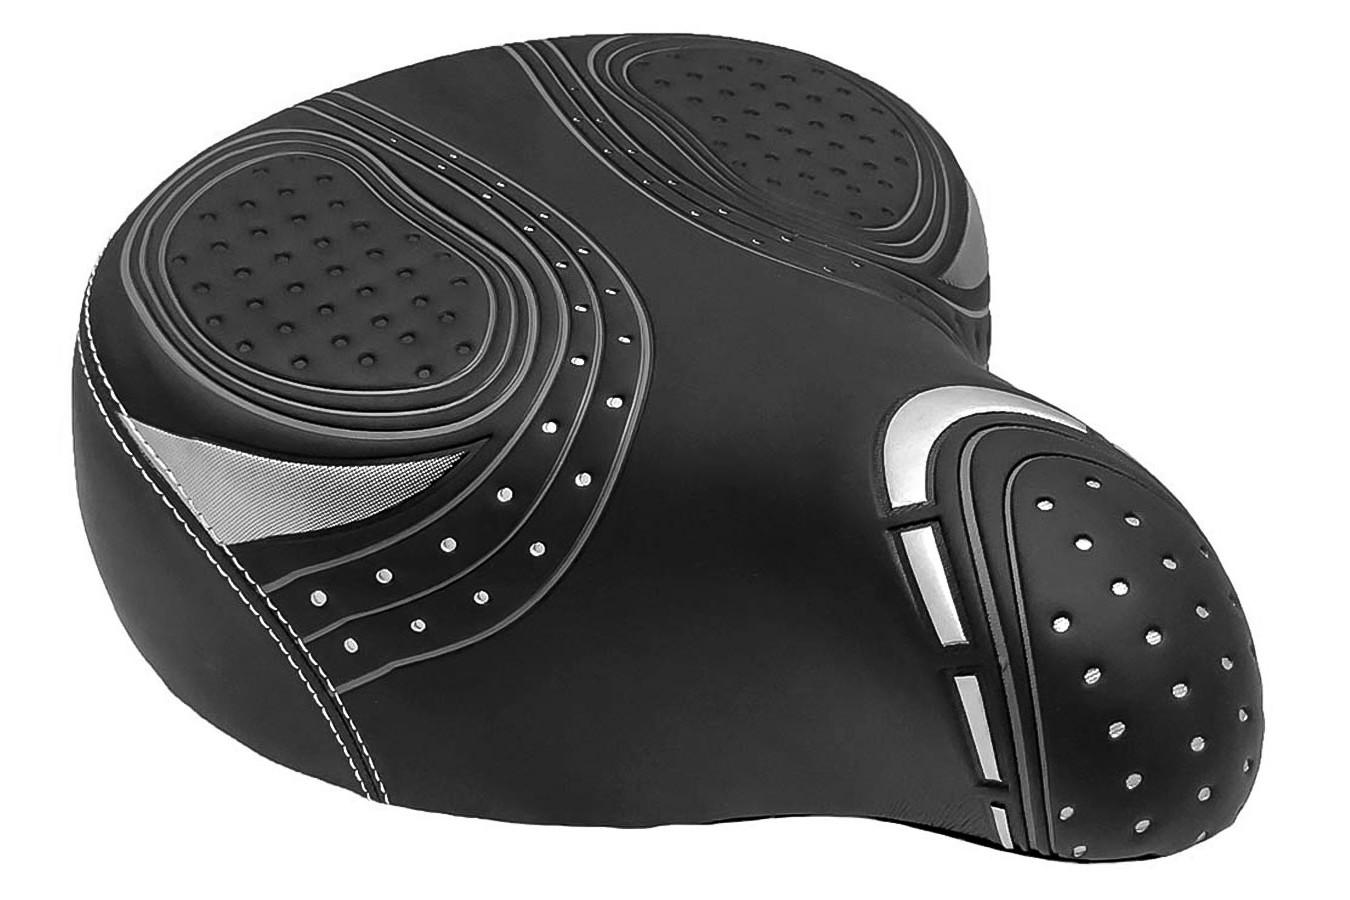 Selim 2 Molas Conforto modelo GW - Elleven